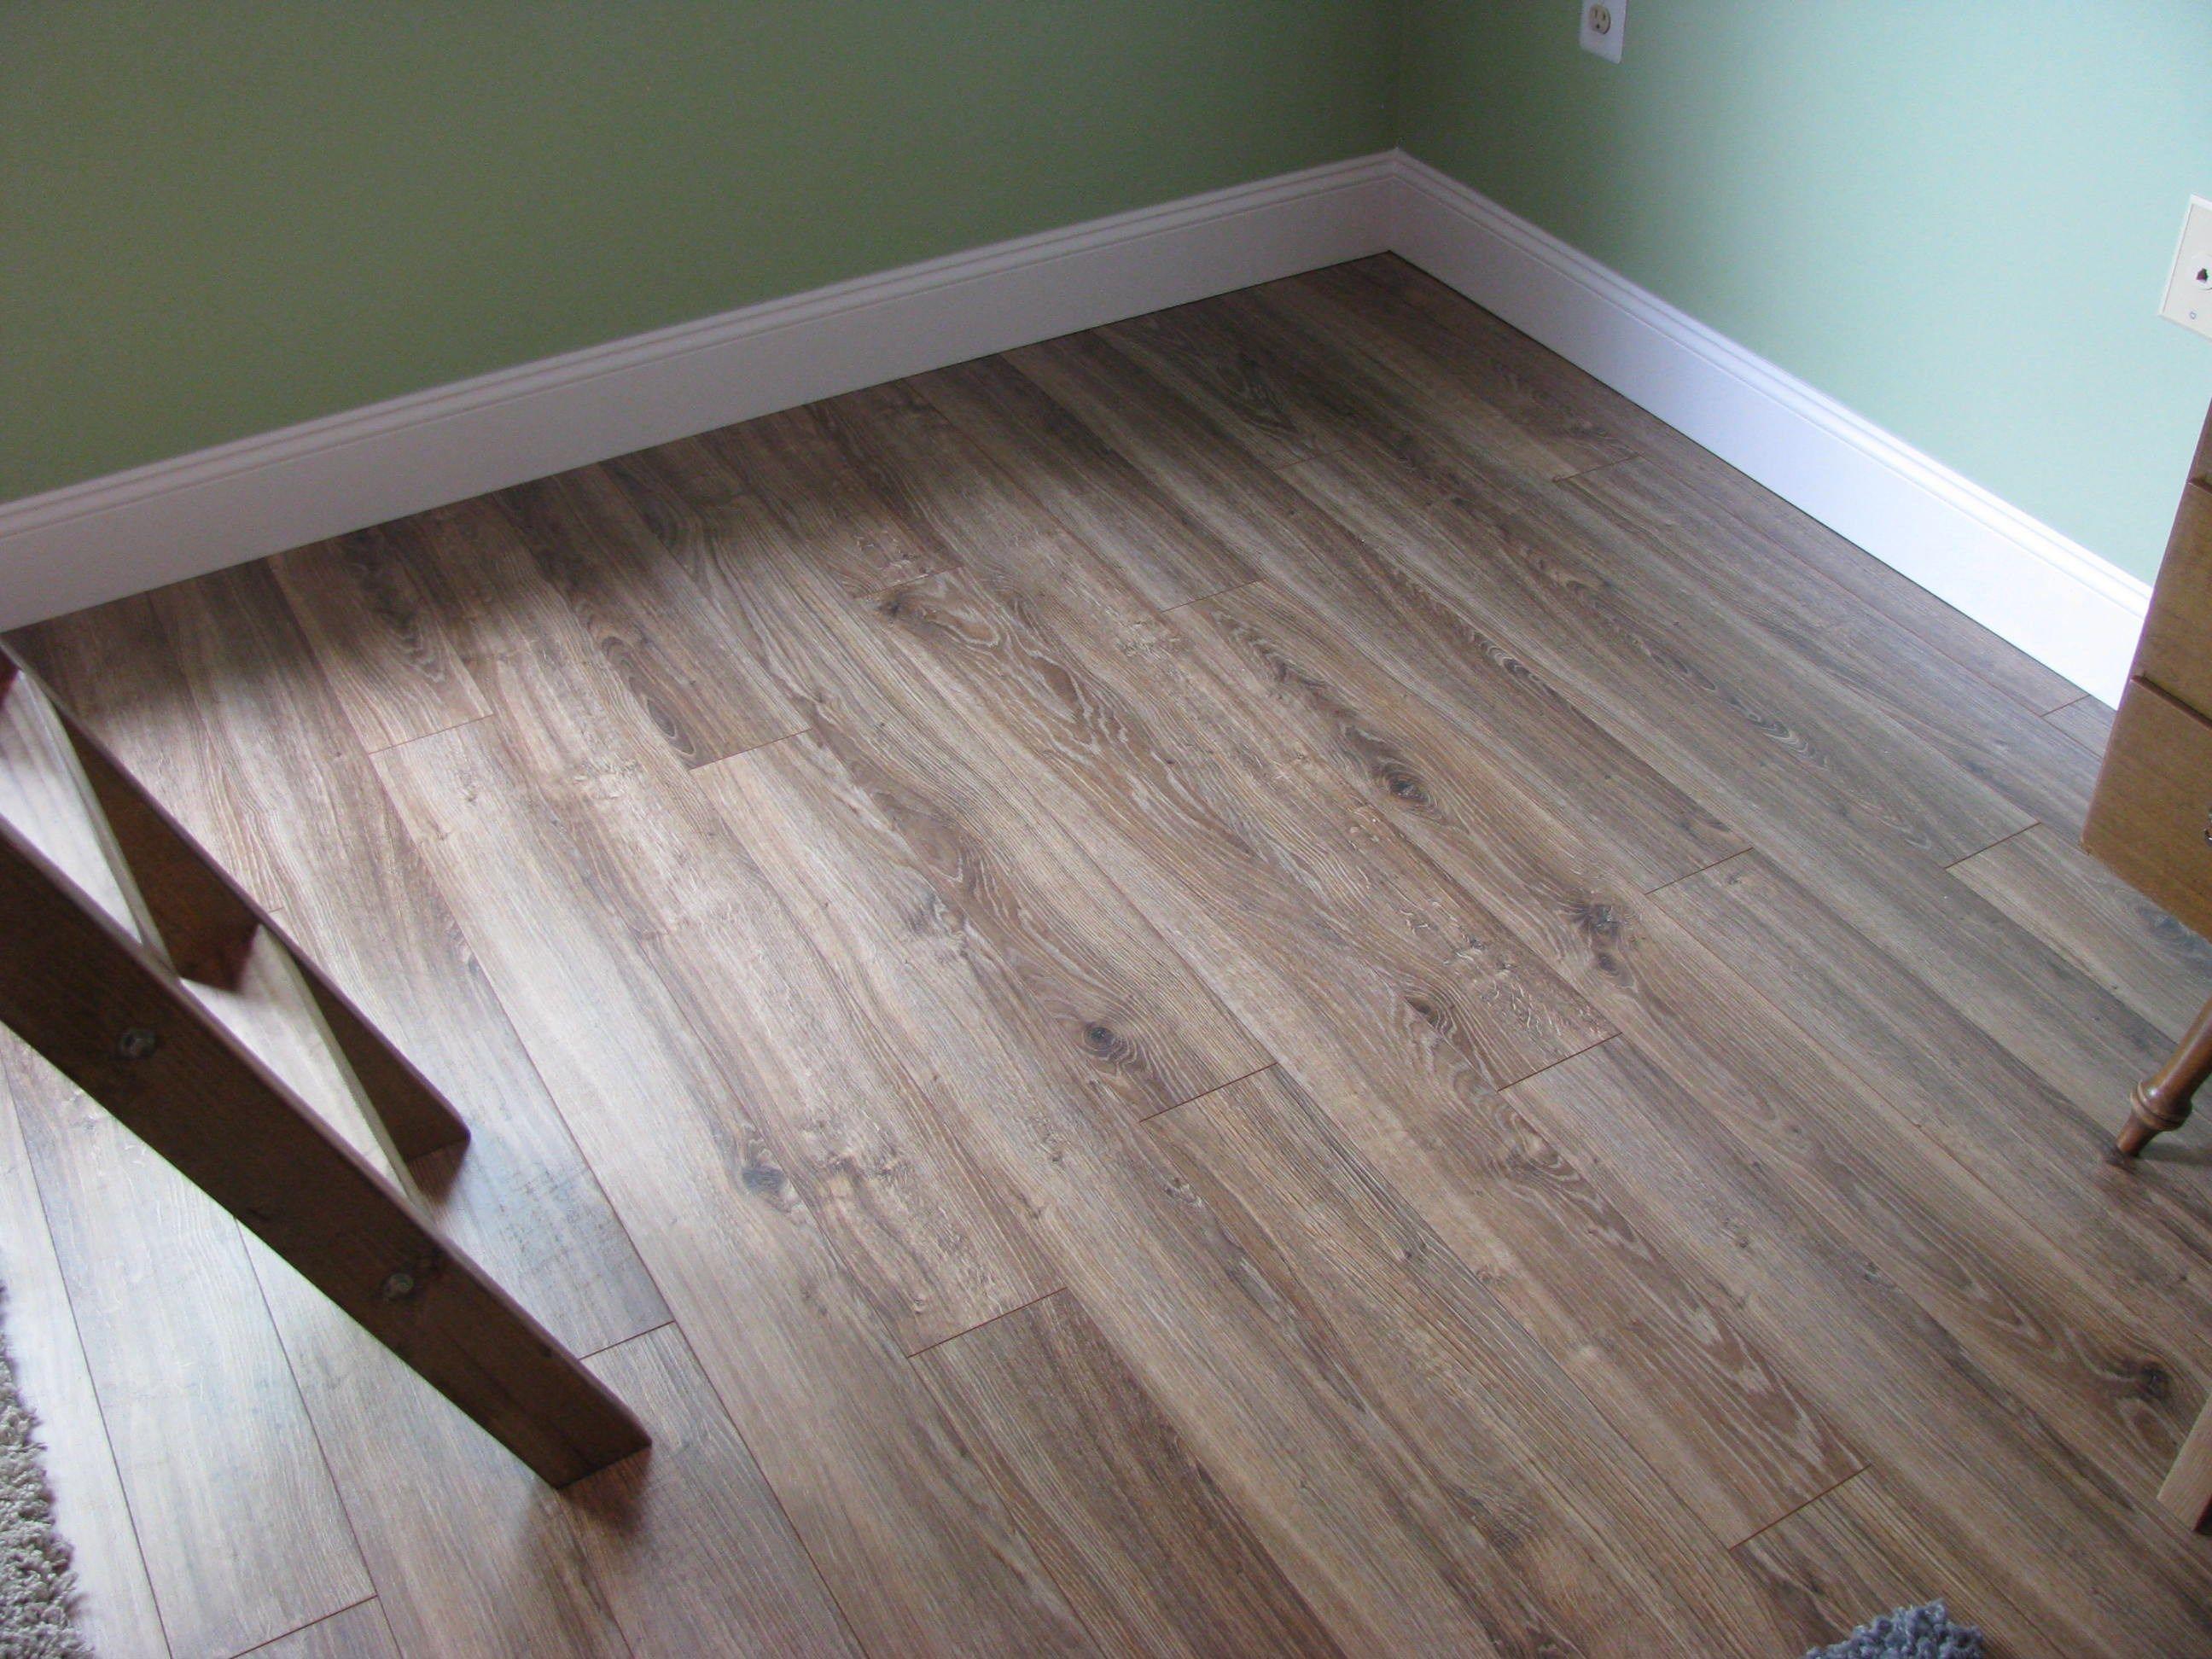 flooring chairmat roth floors diy laminate and r allen com i comments tncffhj imgur